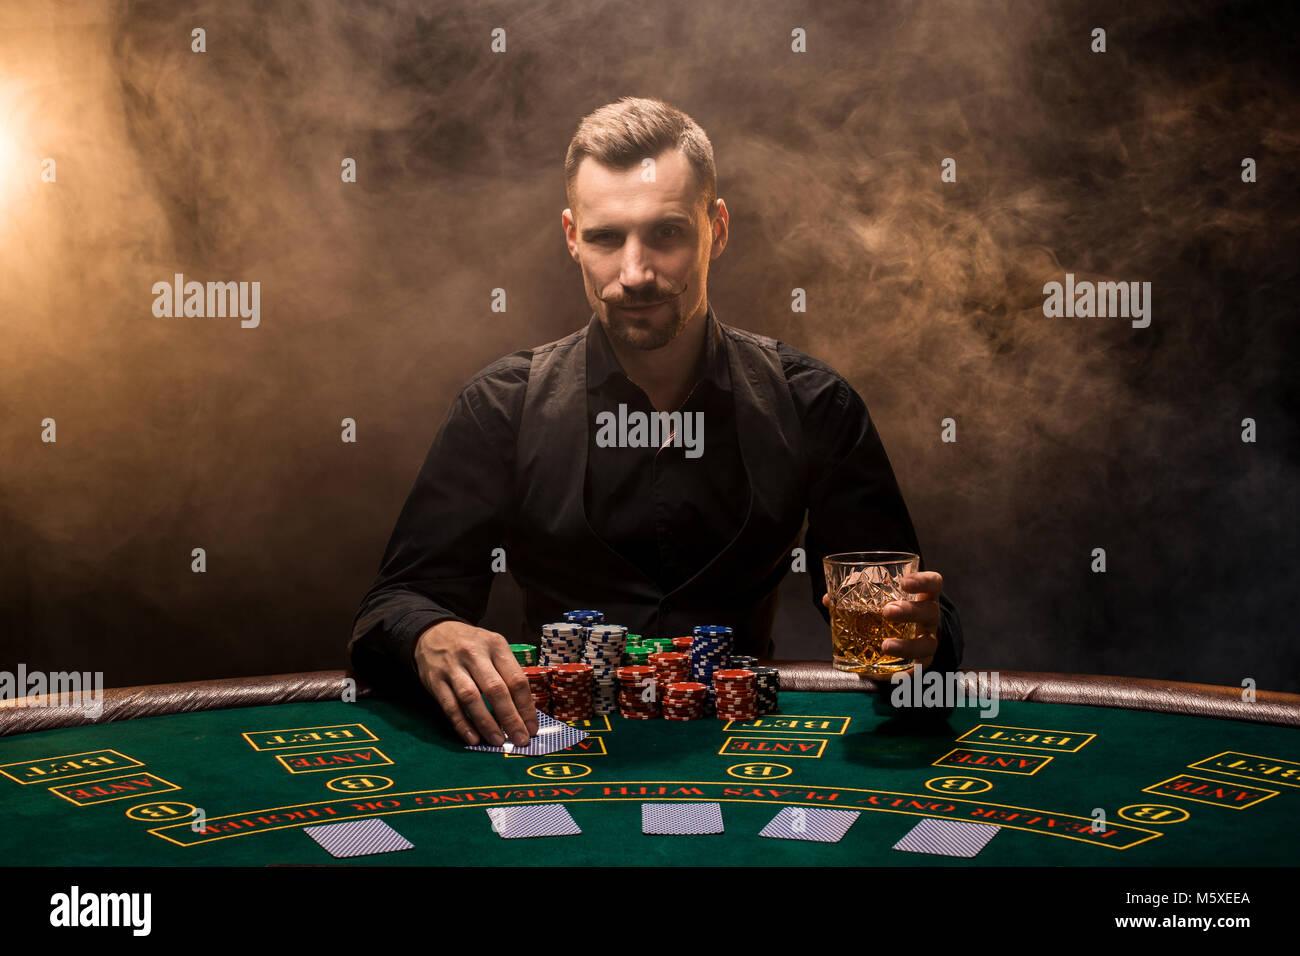 онлайн казино рулетка на андроид